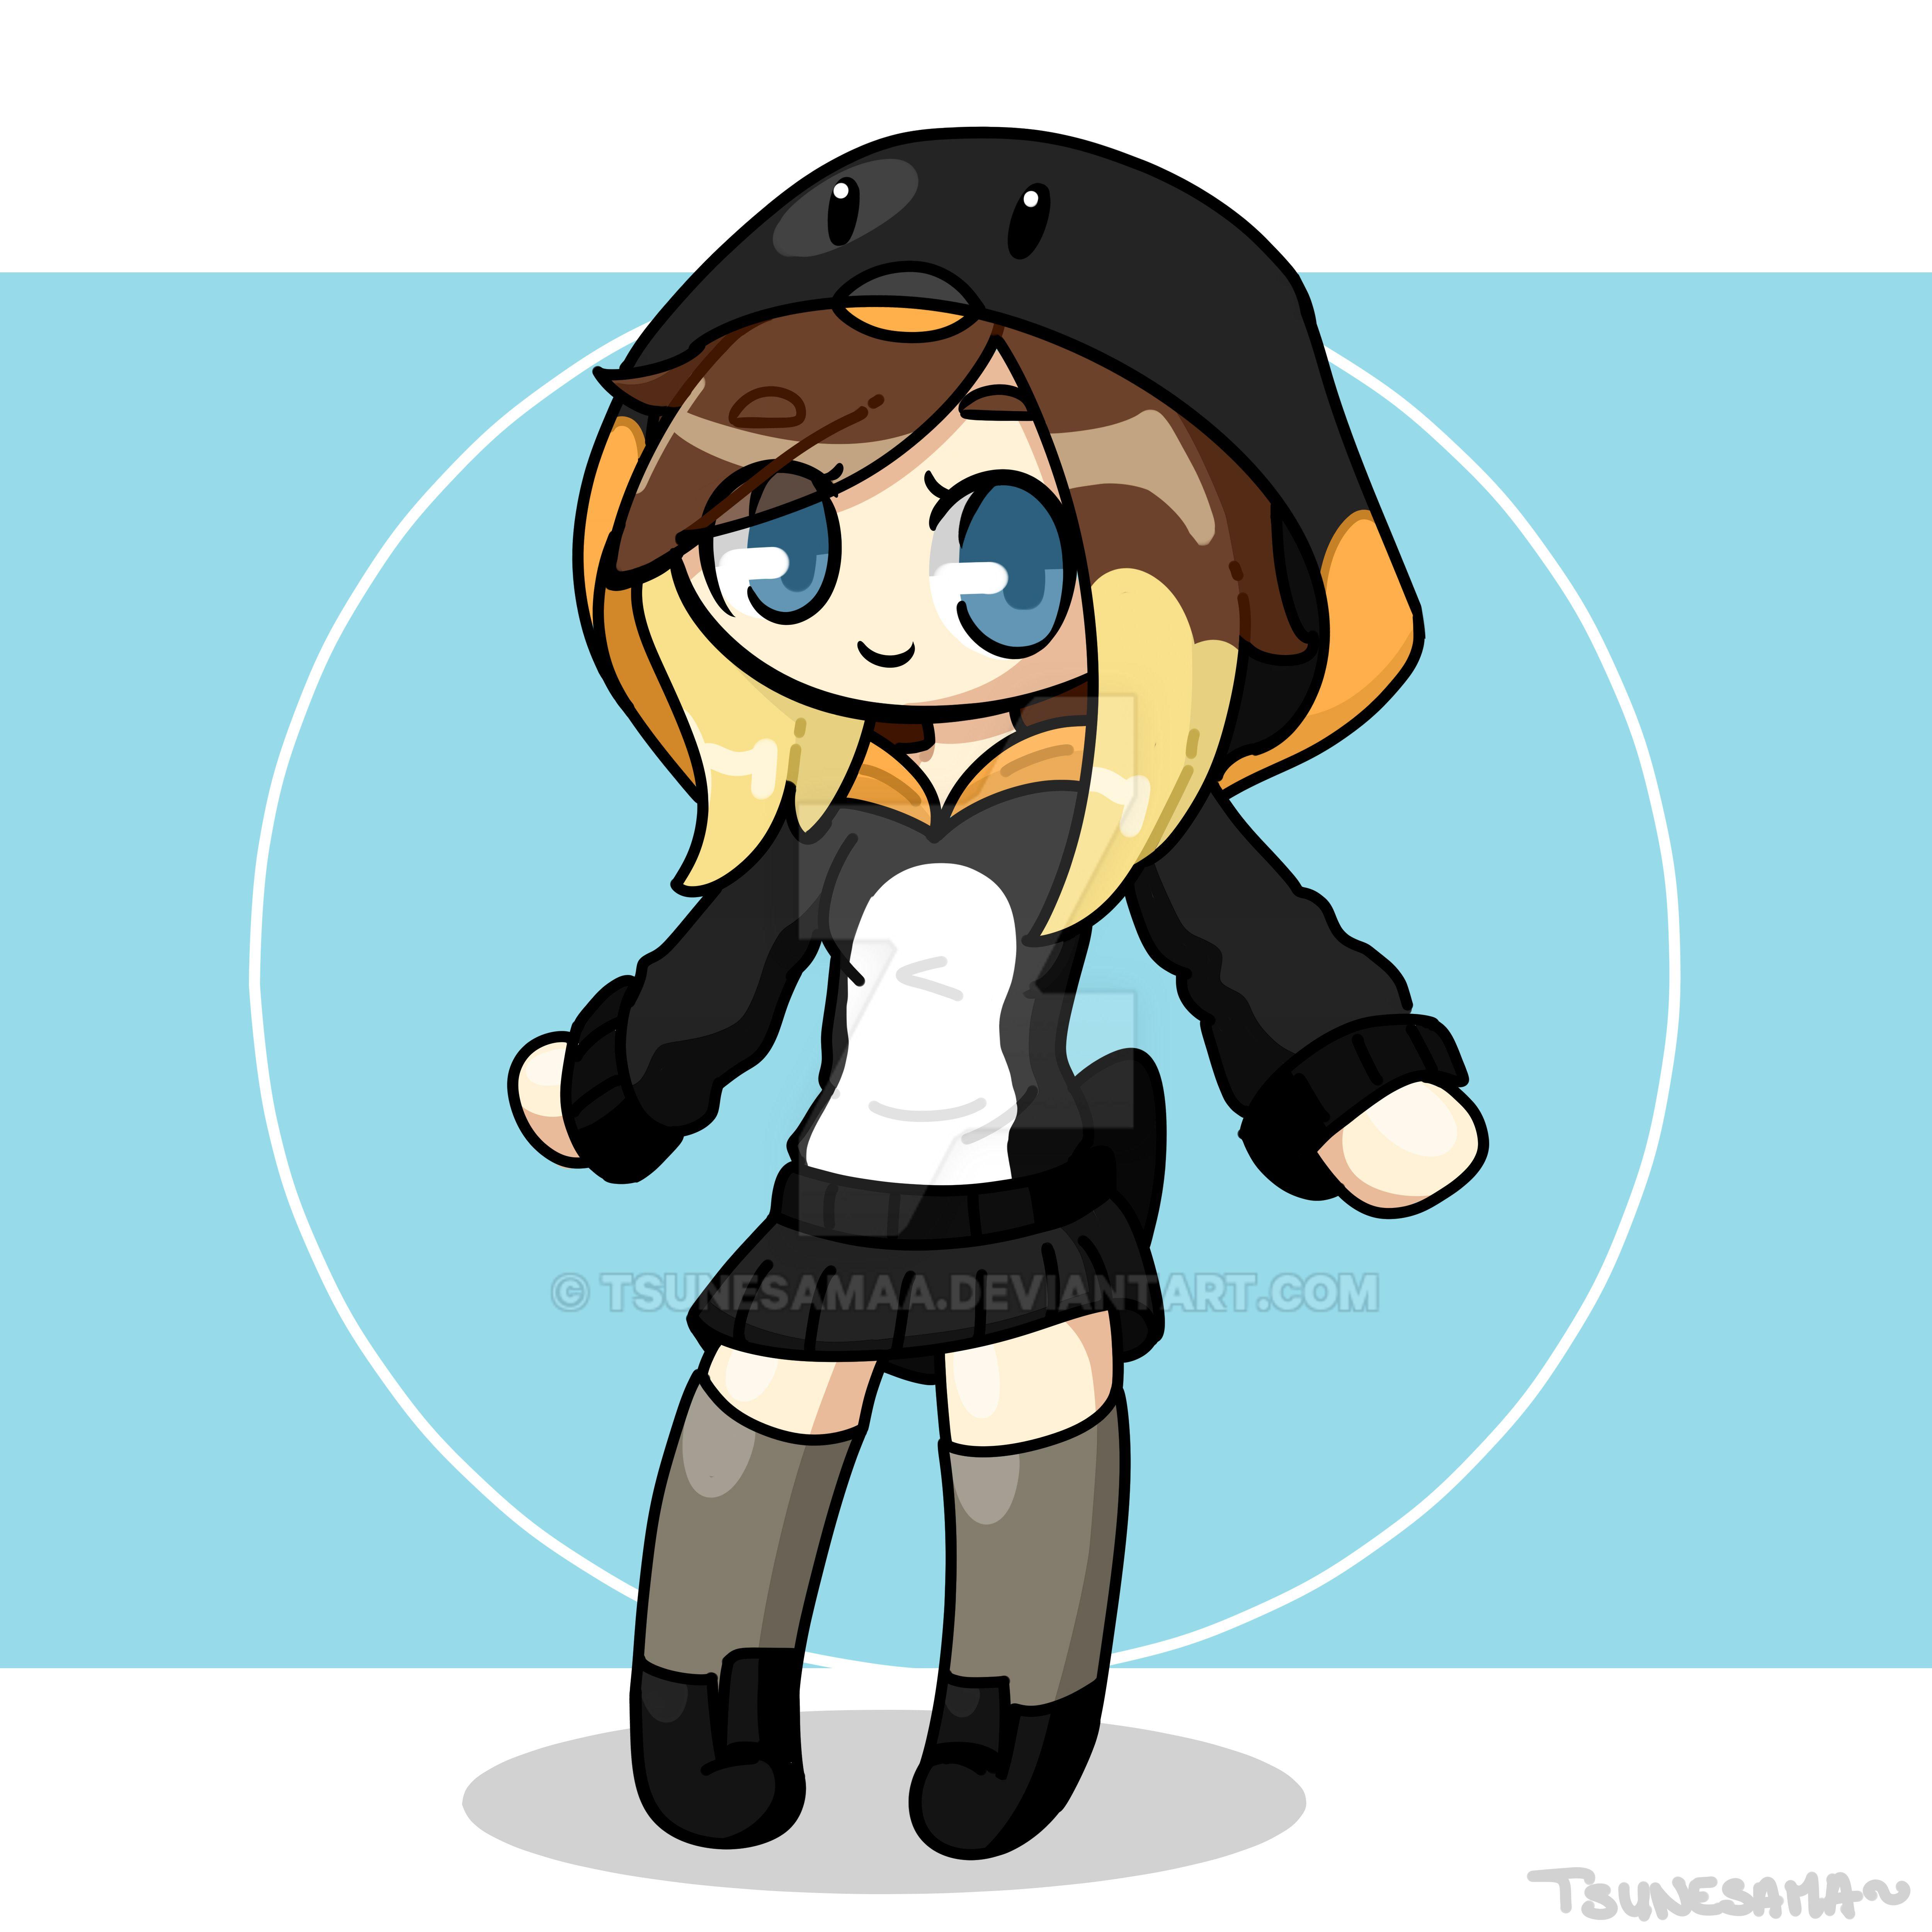 Cartoon style~ Tsune by Tsunesamaa